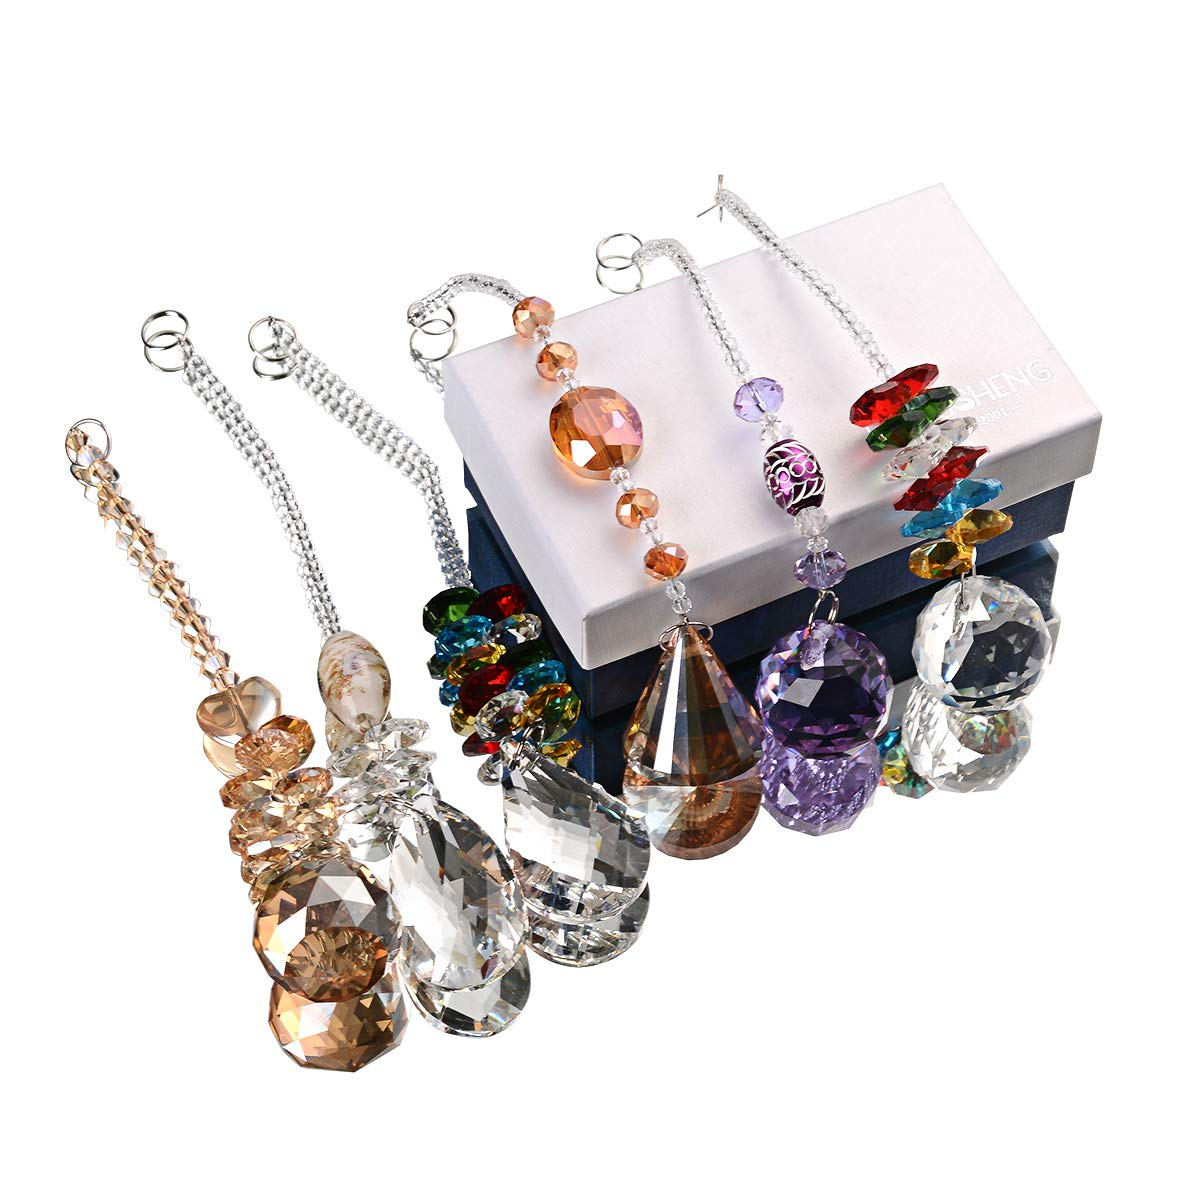 Chandelier Suncatchers Prisms Octogon Chakra Crystal Balls for Home,Office,Garden Decoration Set of 6 Beautiful Pendants for Car,Plant,Window Decor Octagonal,Teardrop /& Cone Shaped Prisms